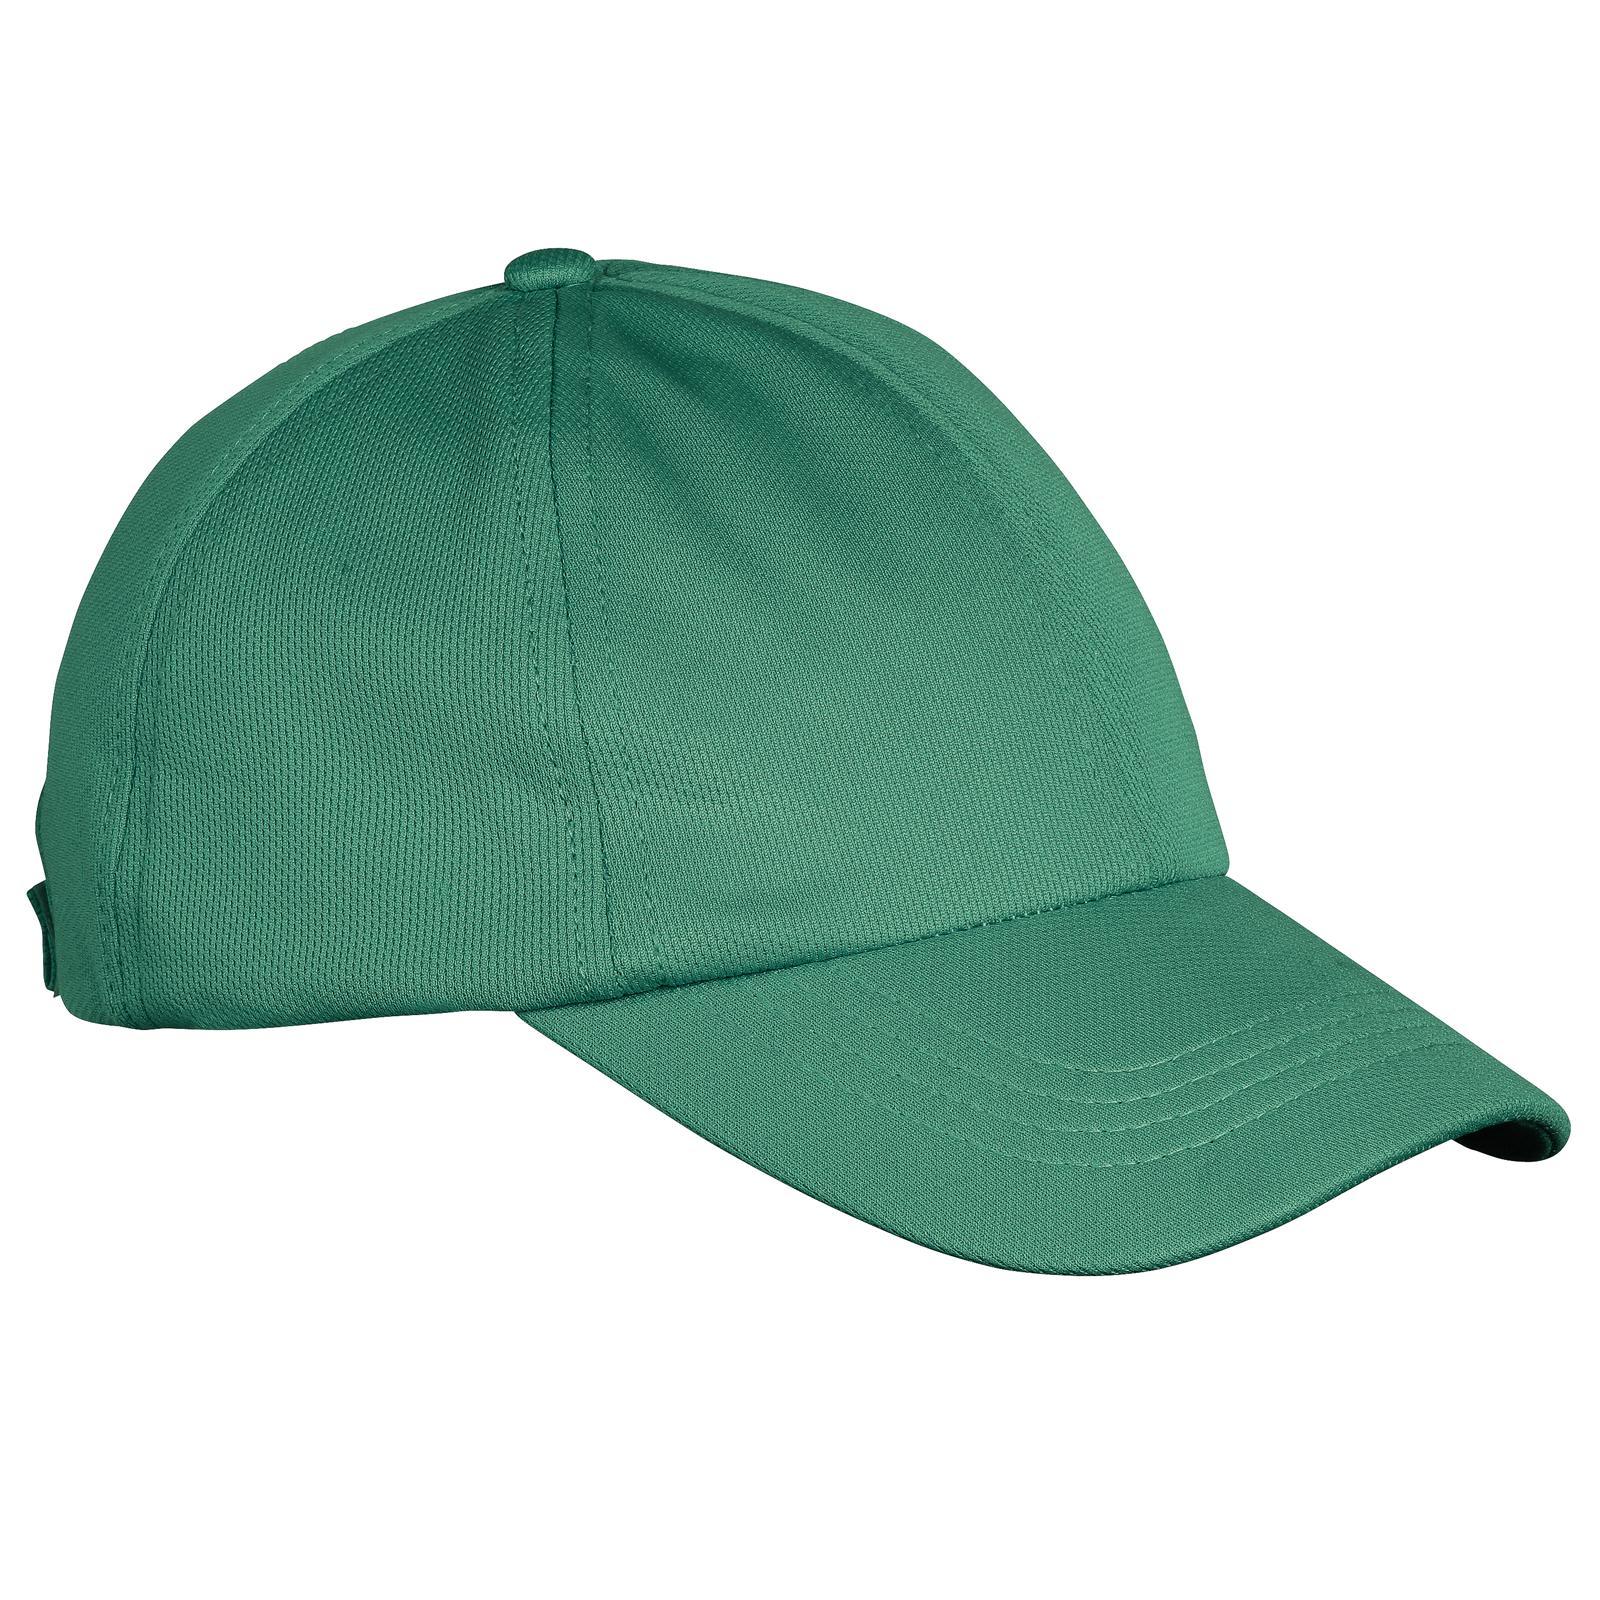 new just cool childrens sports 6 panel baseball cap